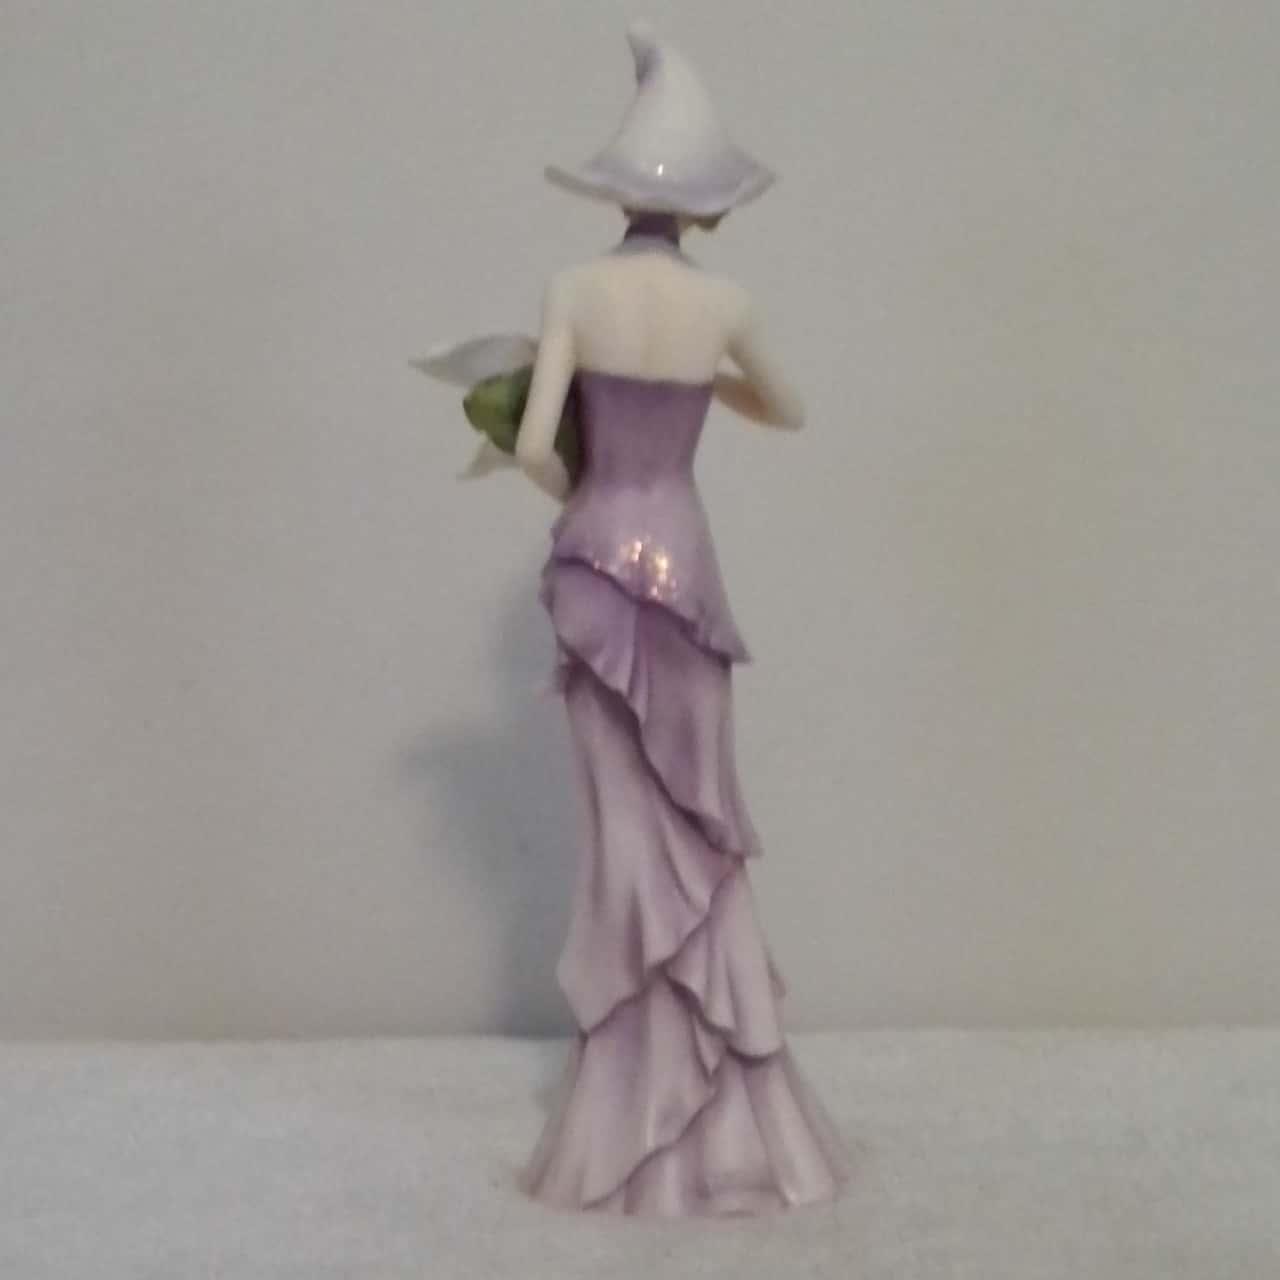 LEONARDO FIGURINE 'FLOWER PRINCESS' Purple  Approx 25 cm tall RRP $75.00